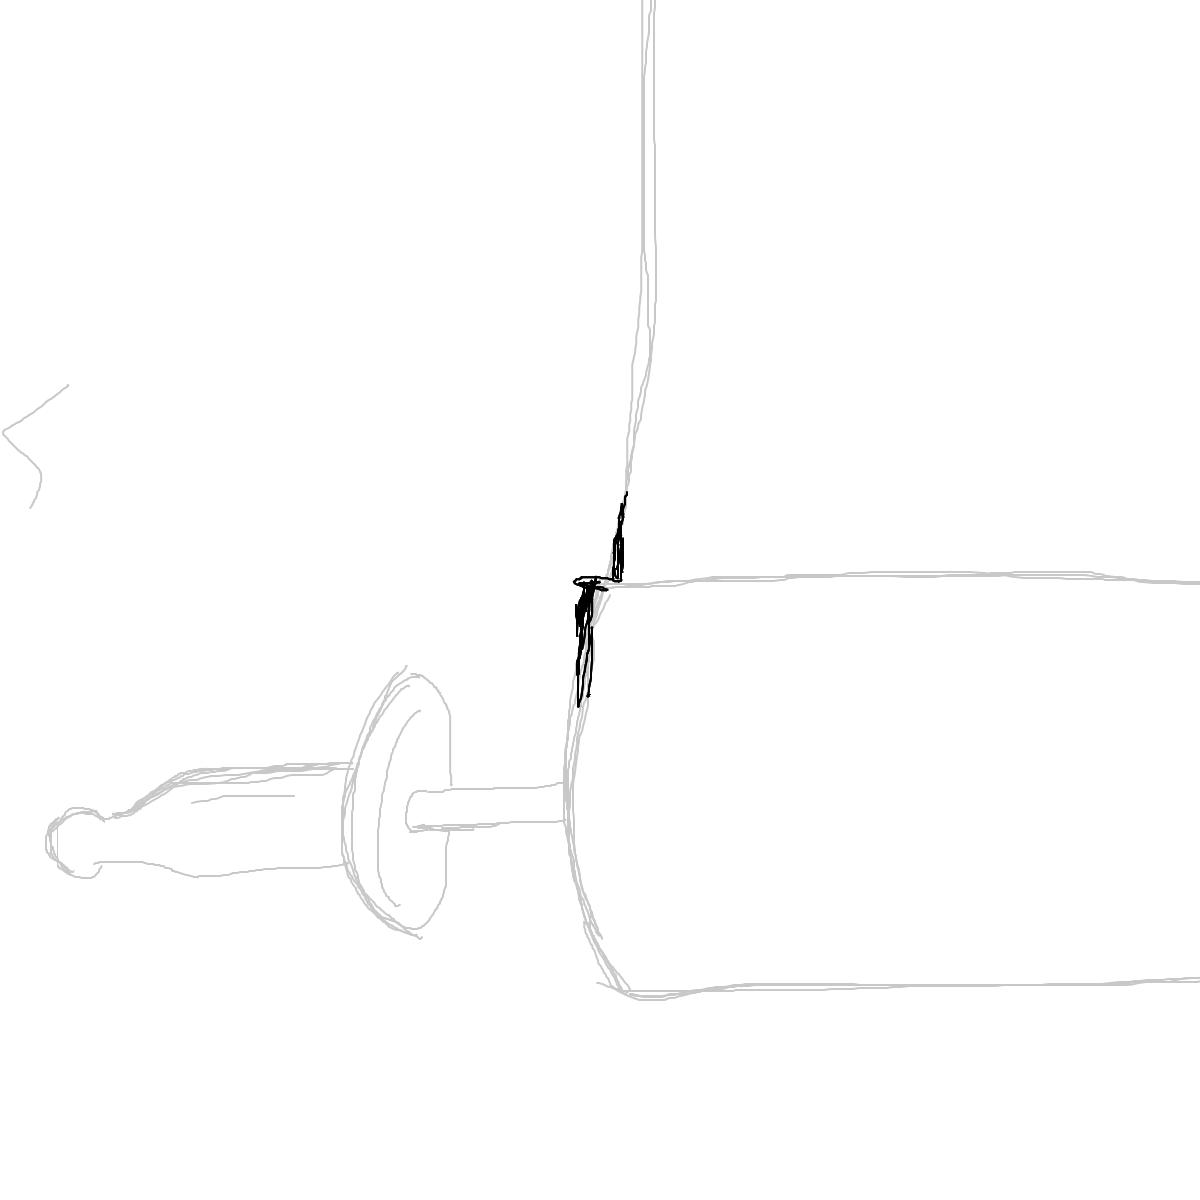 BAAAM drawing#10701 lat:51.0362777709960940lng: -114.0525207519531200